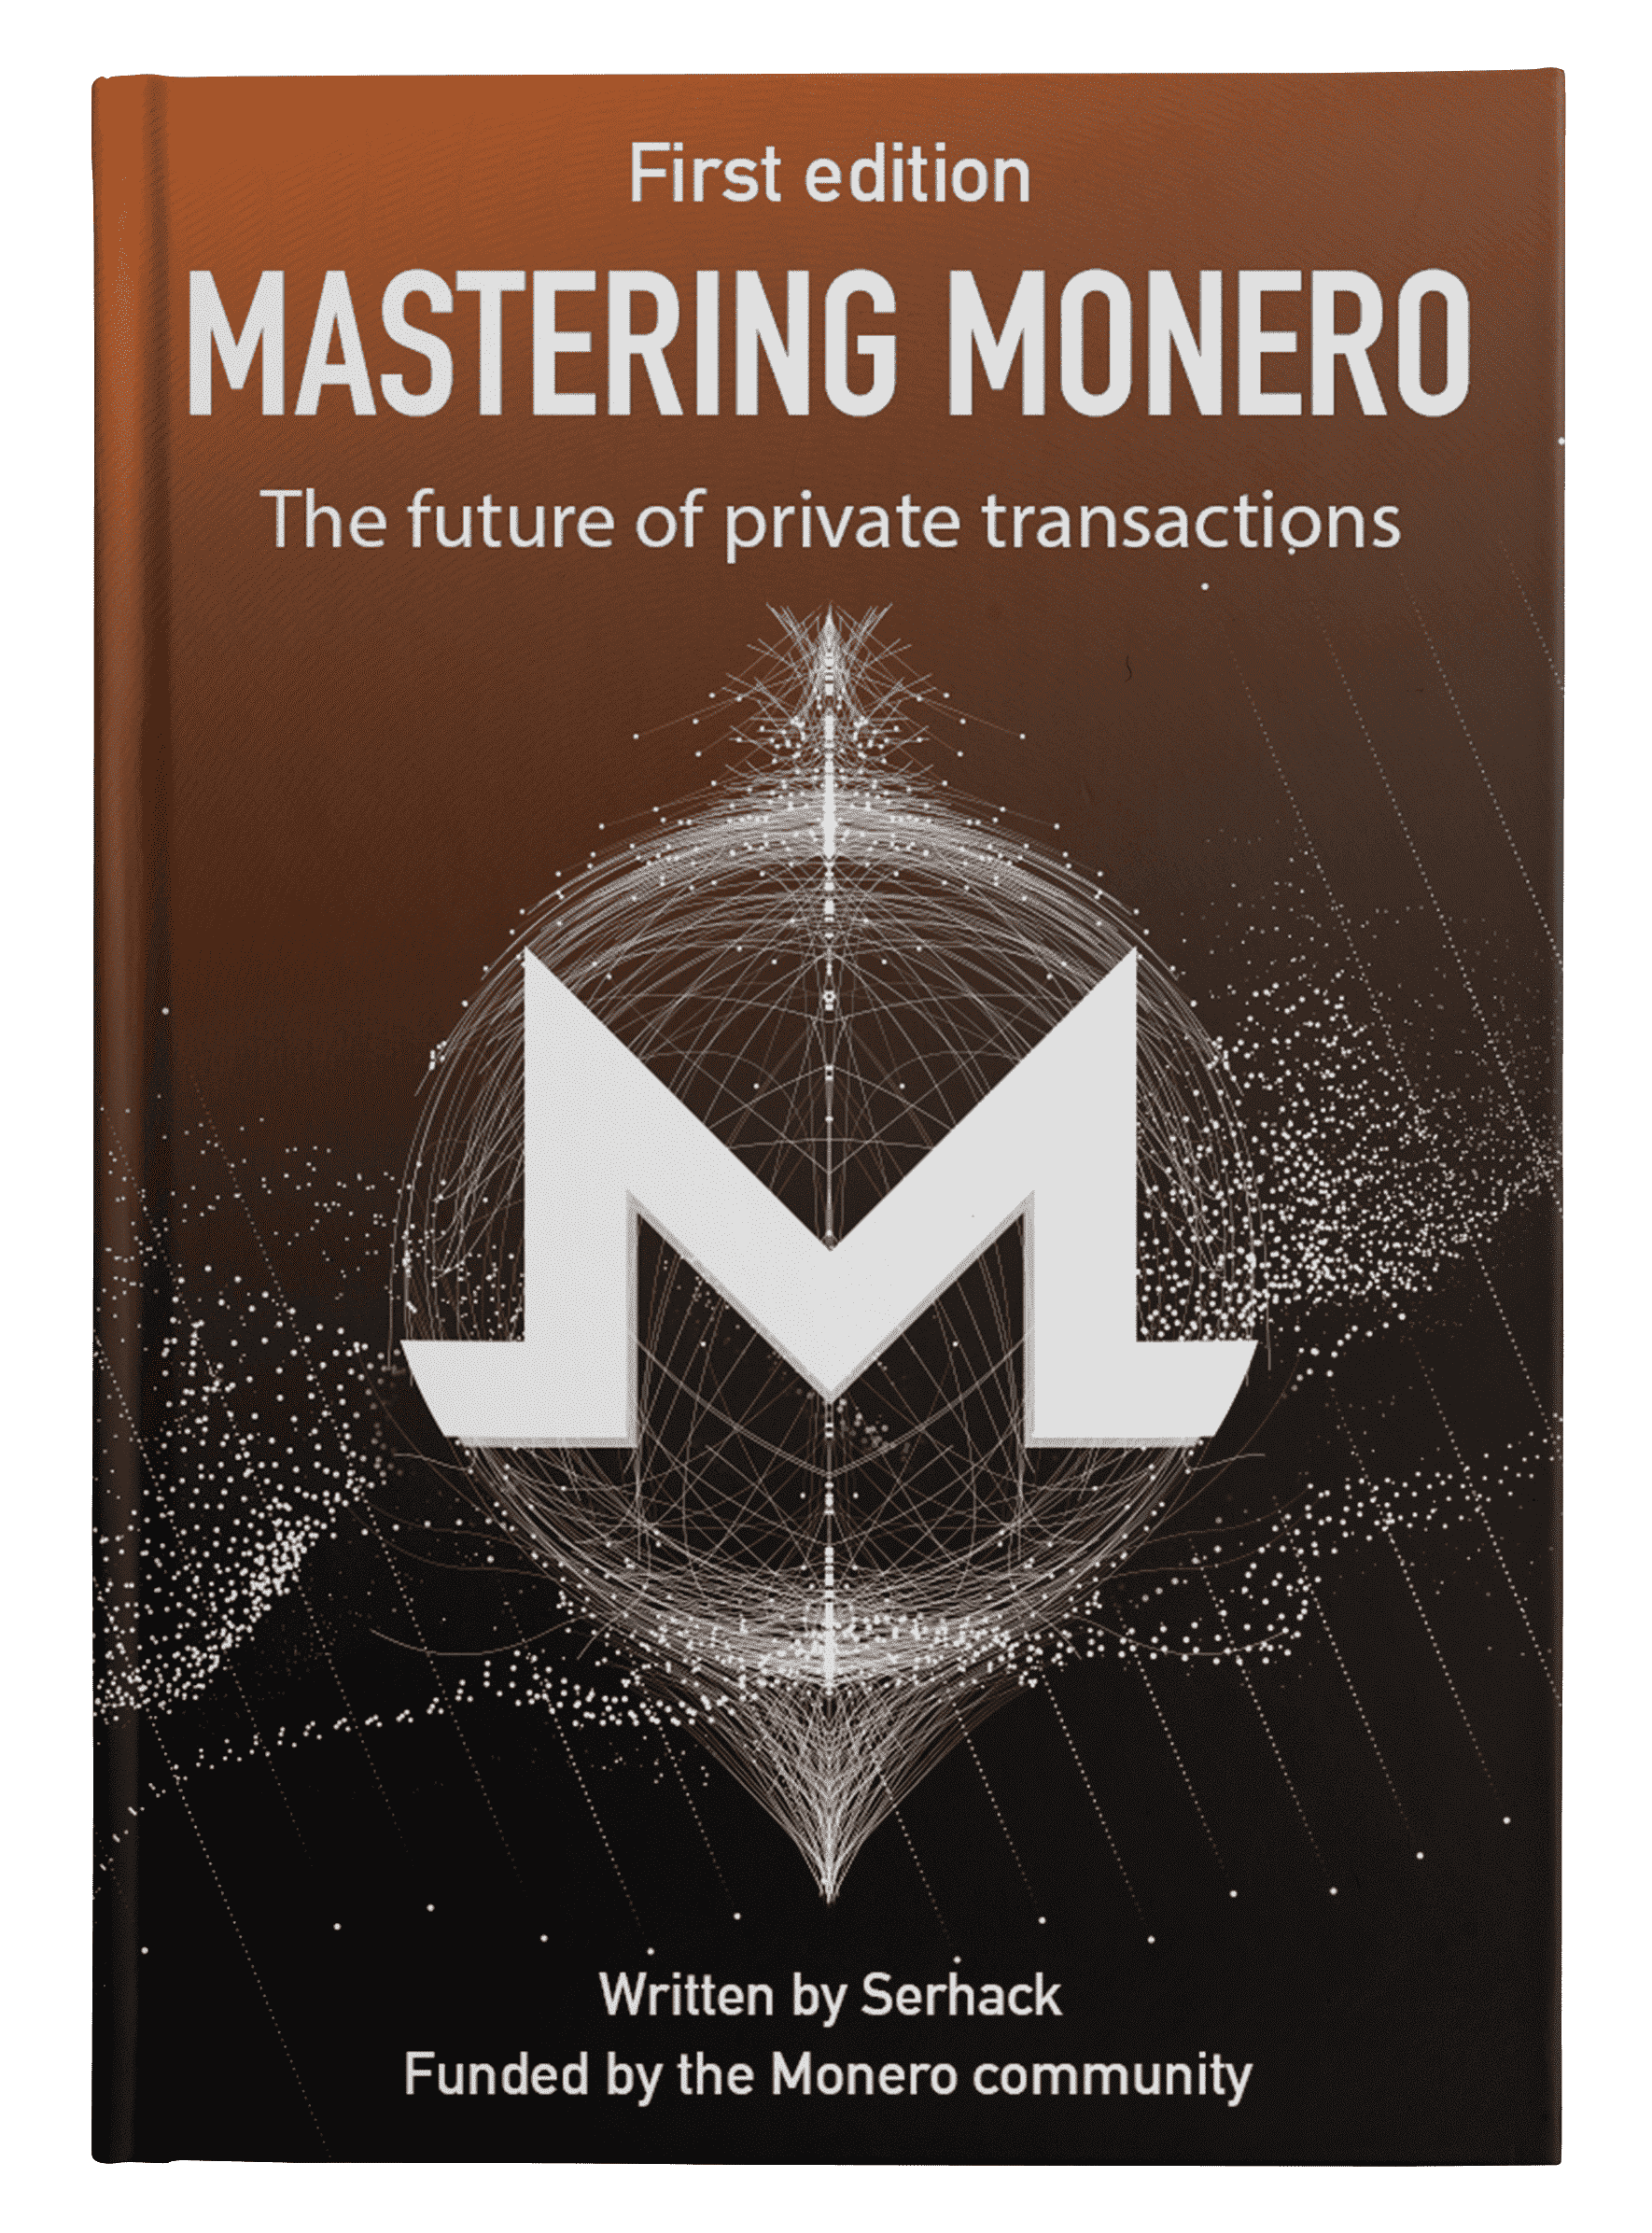 Mastering Monero book